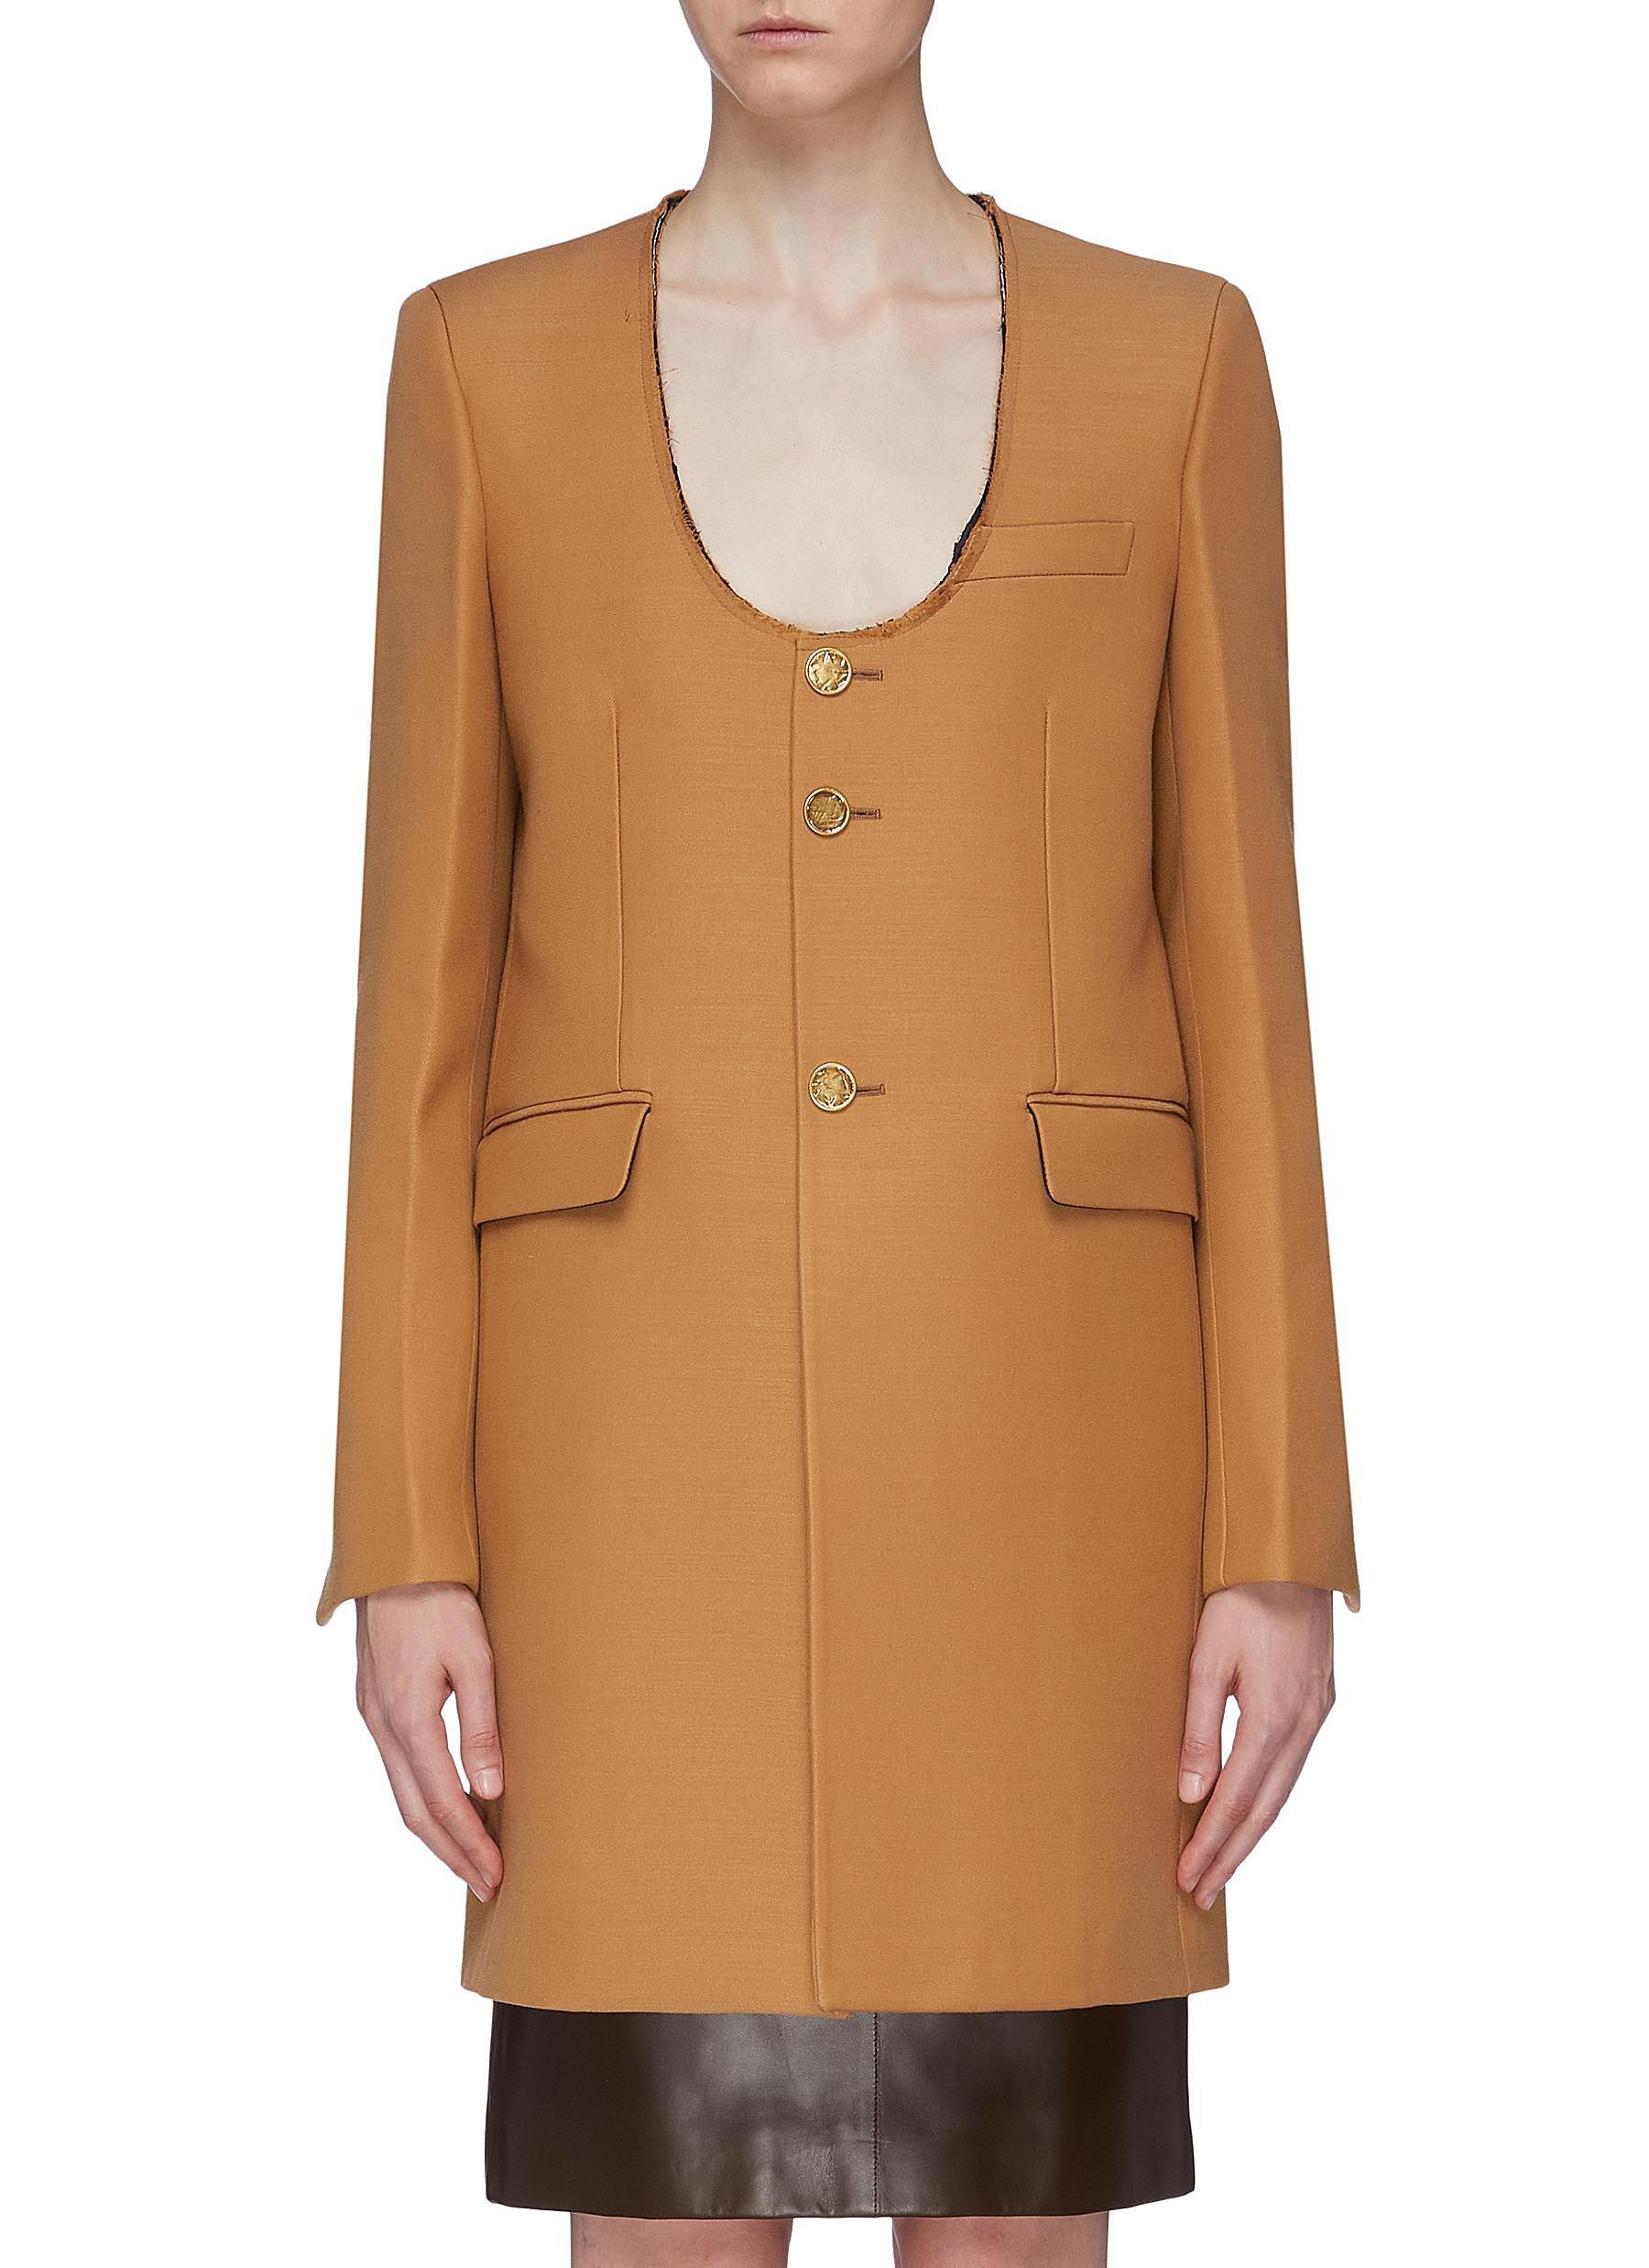 Distressed scoop neck coat by Bottega Veneta